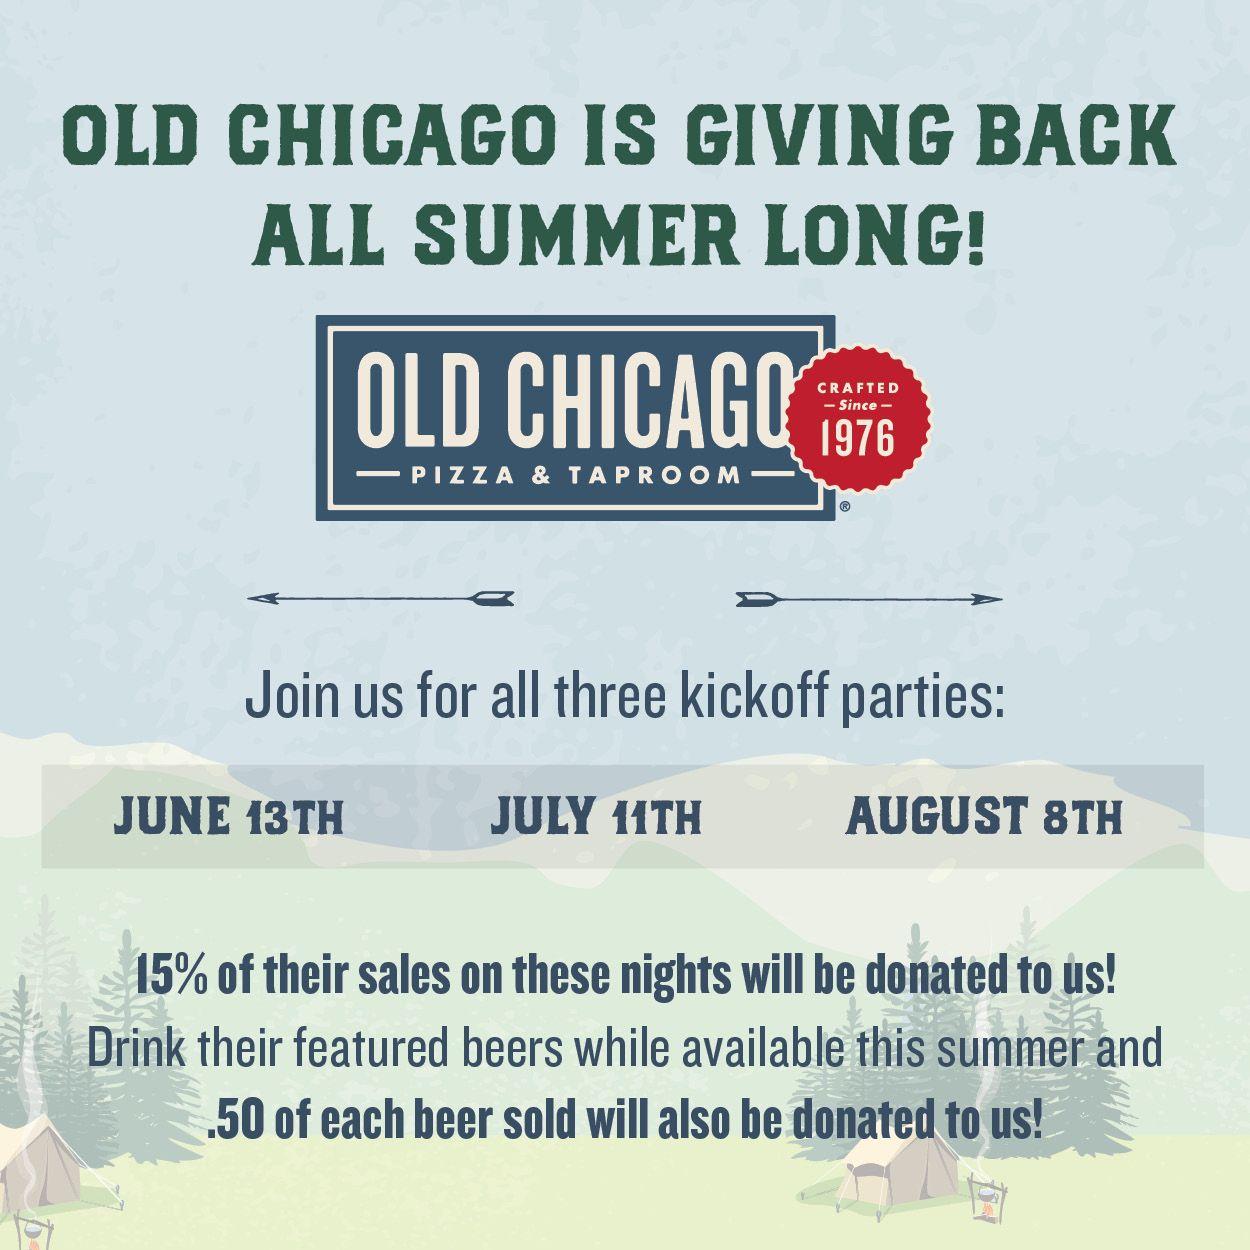 Old Chicago Summer Camp Challenge To Benefit CEDARS